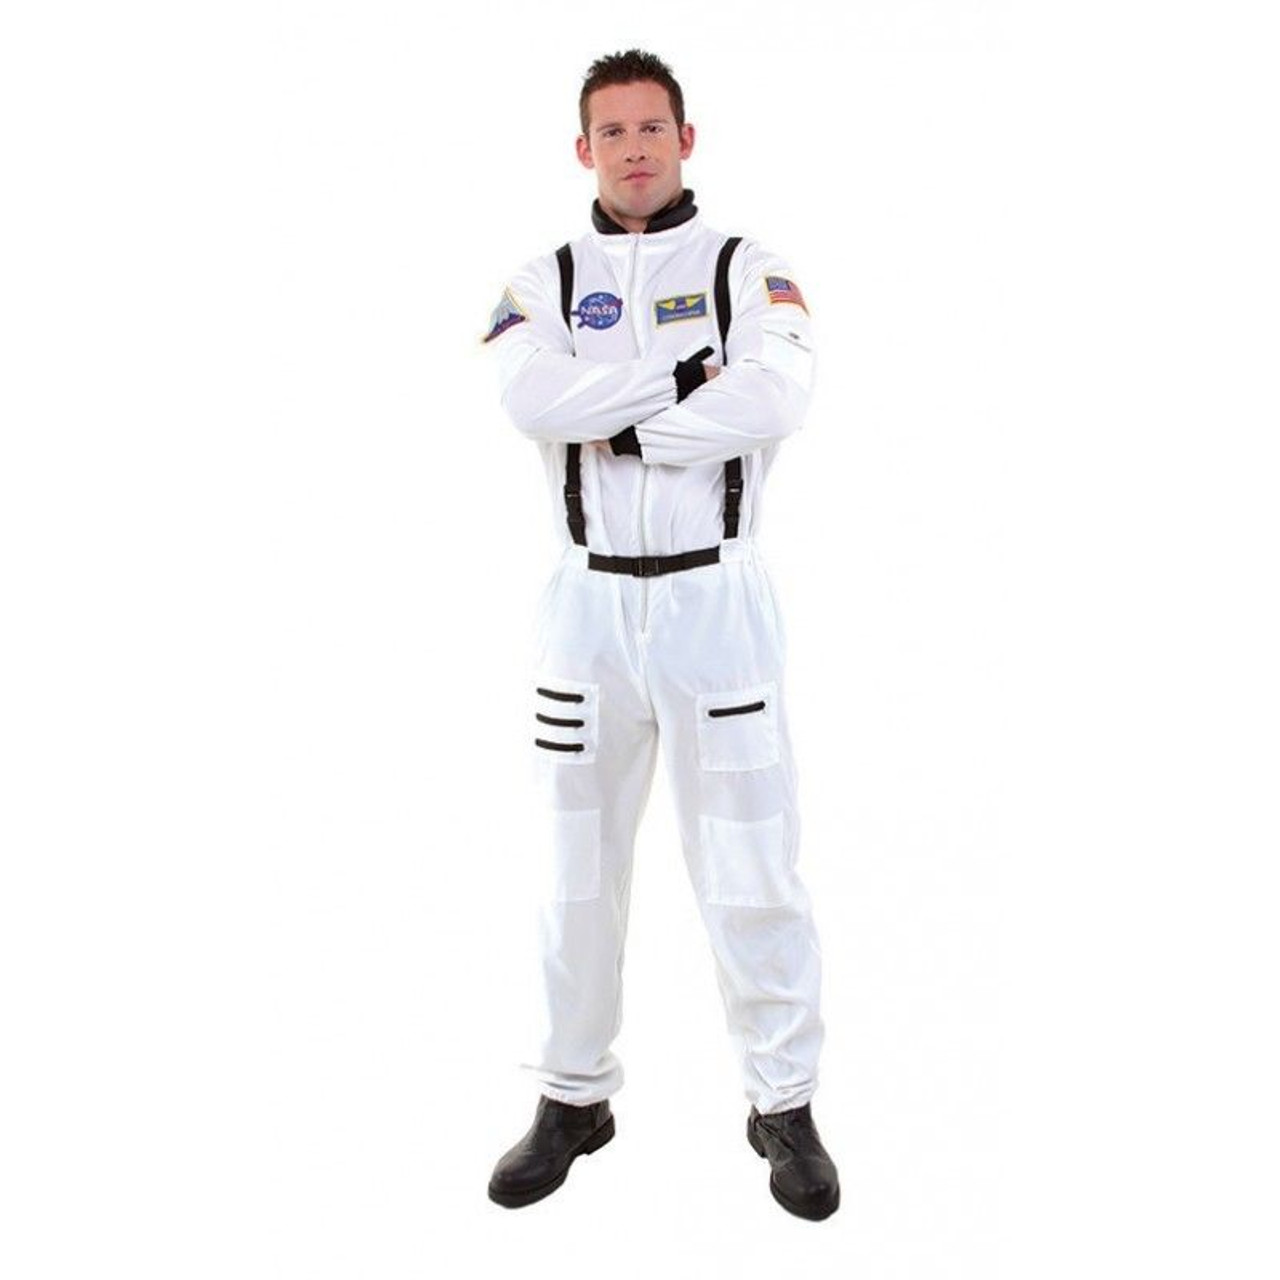 Astronaut Adult NASA Costume White Space Jumpsuit Underwraps 29362 Mens